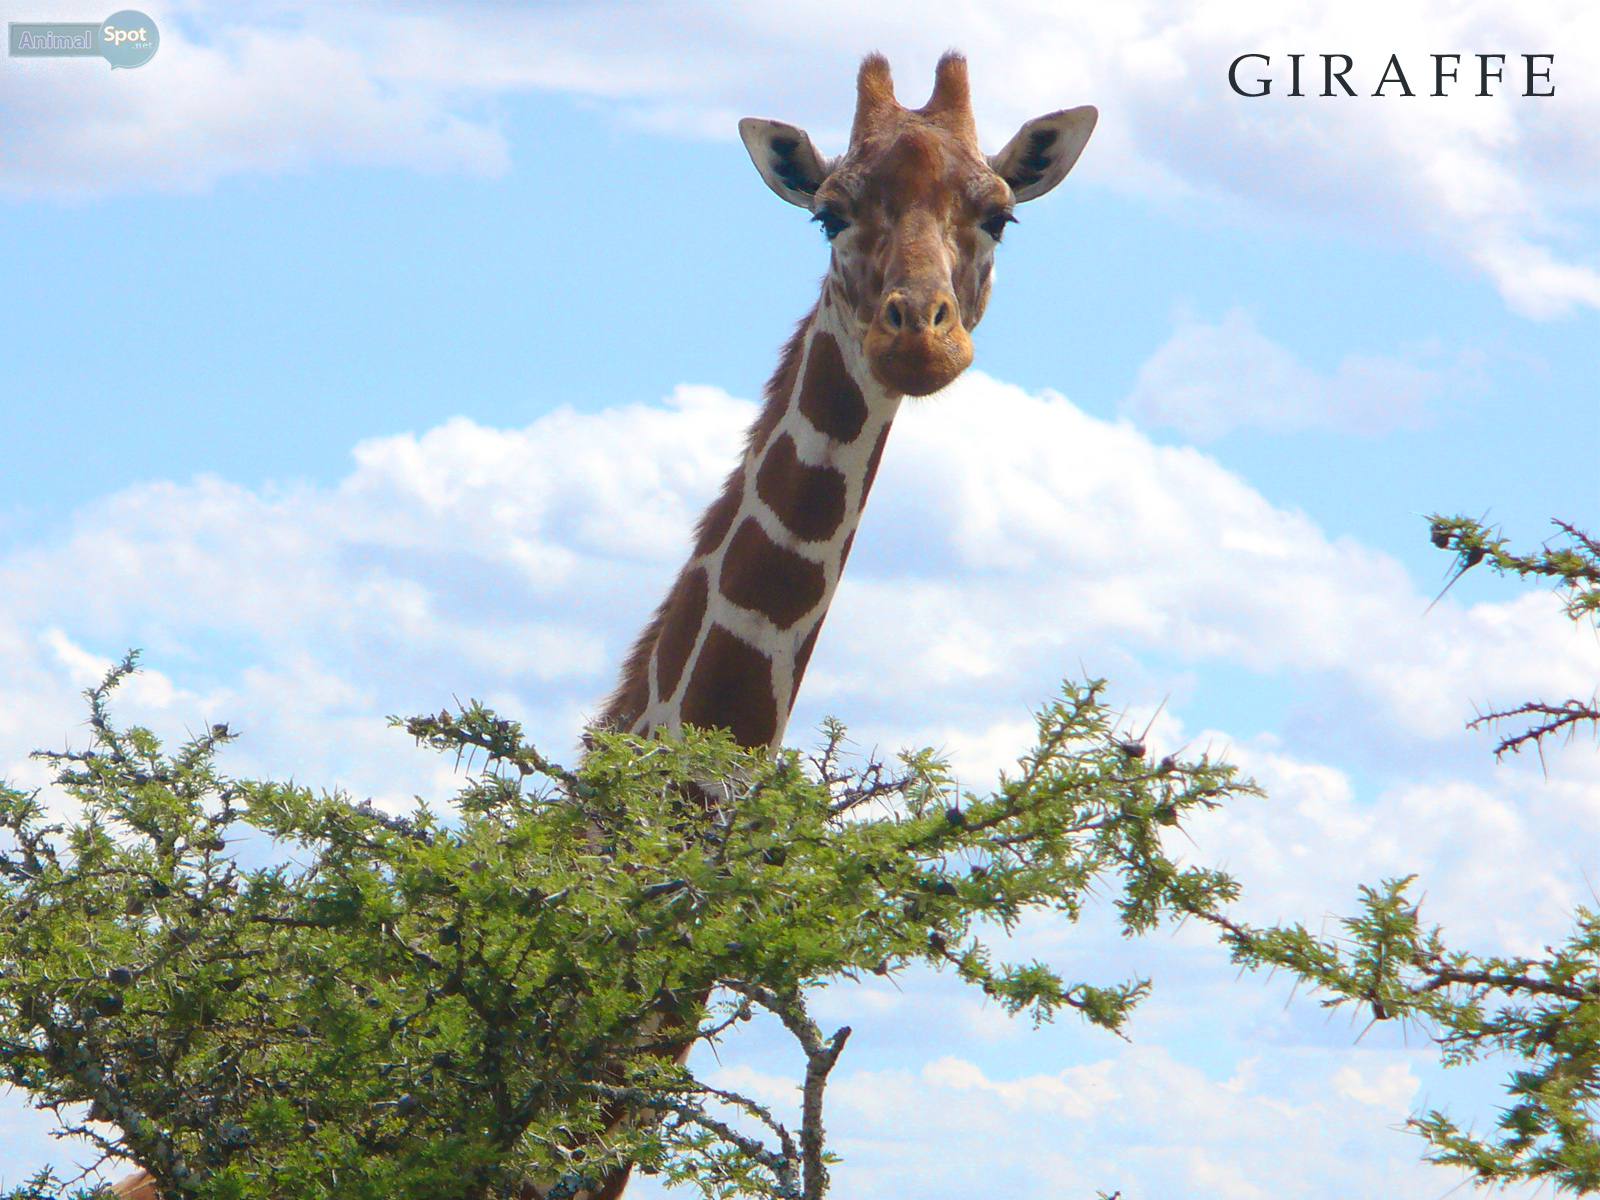 Giraffe Wallpapers – Animal Spot